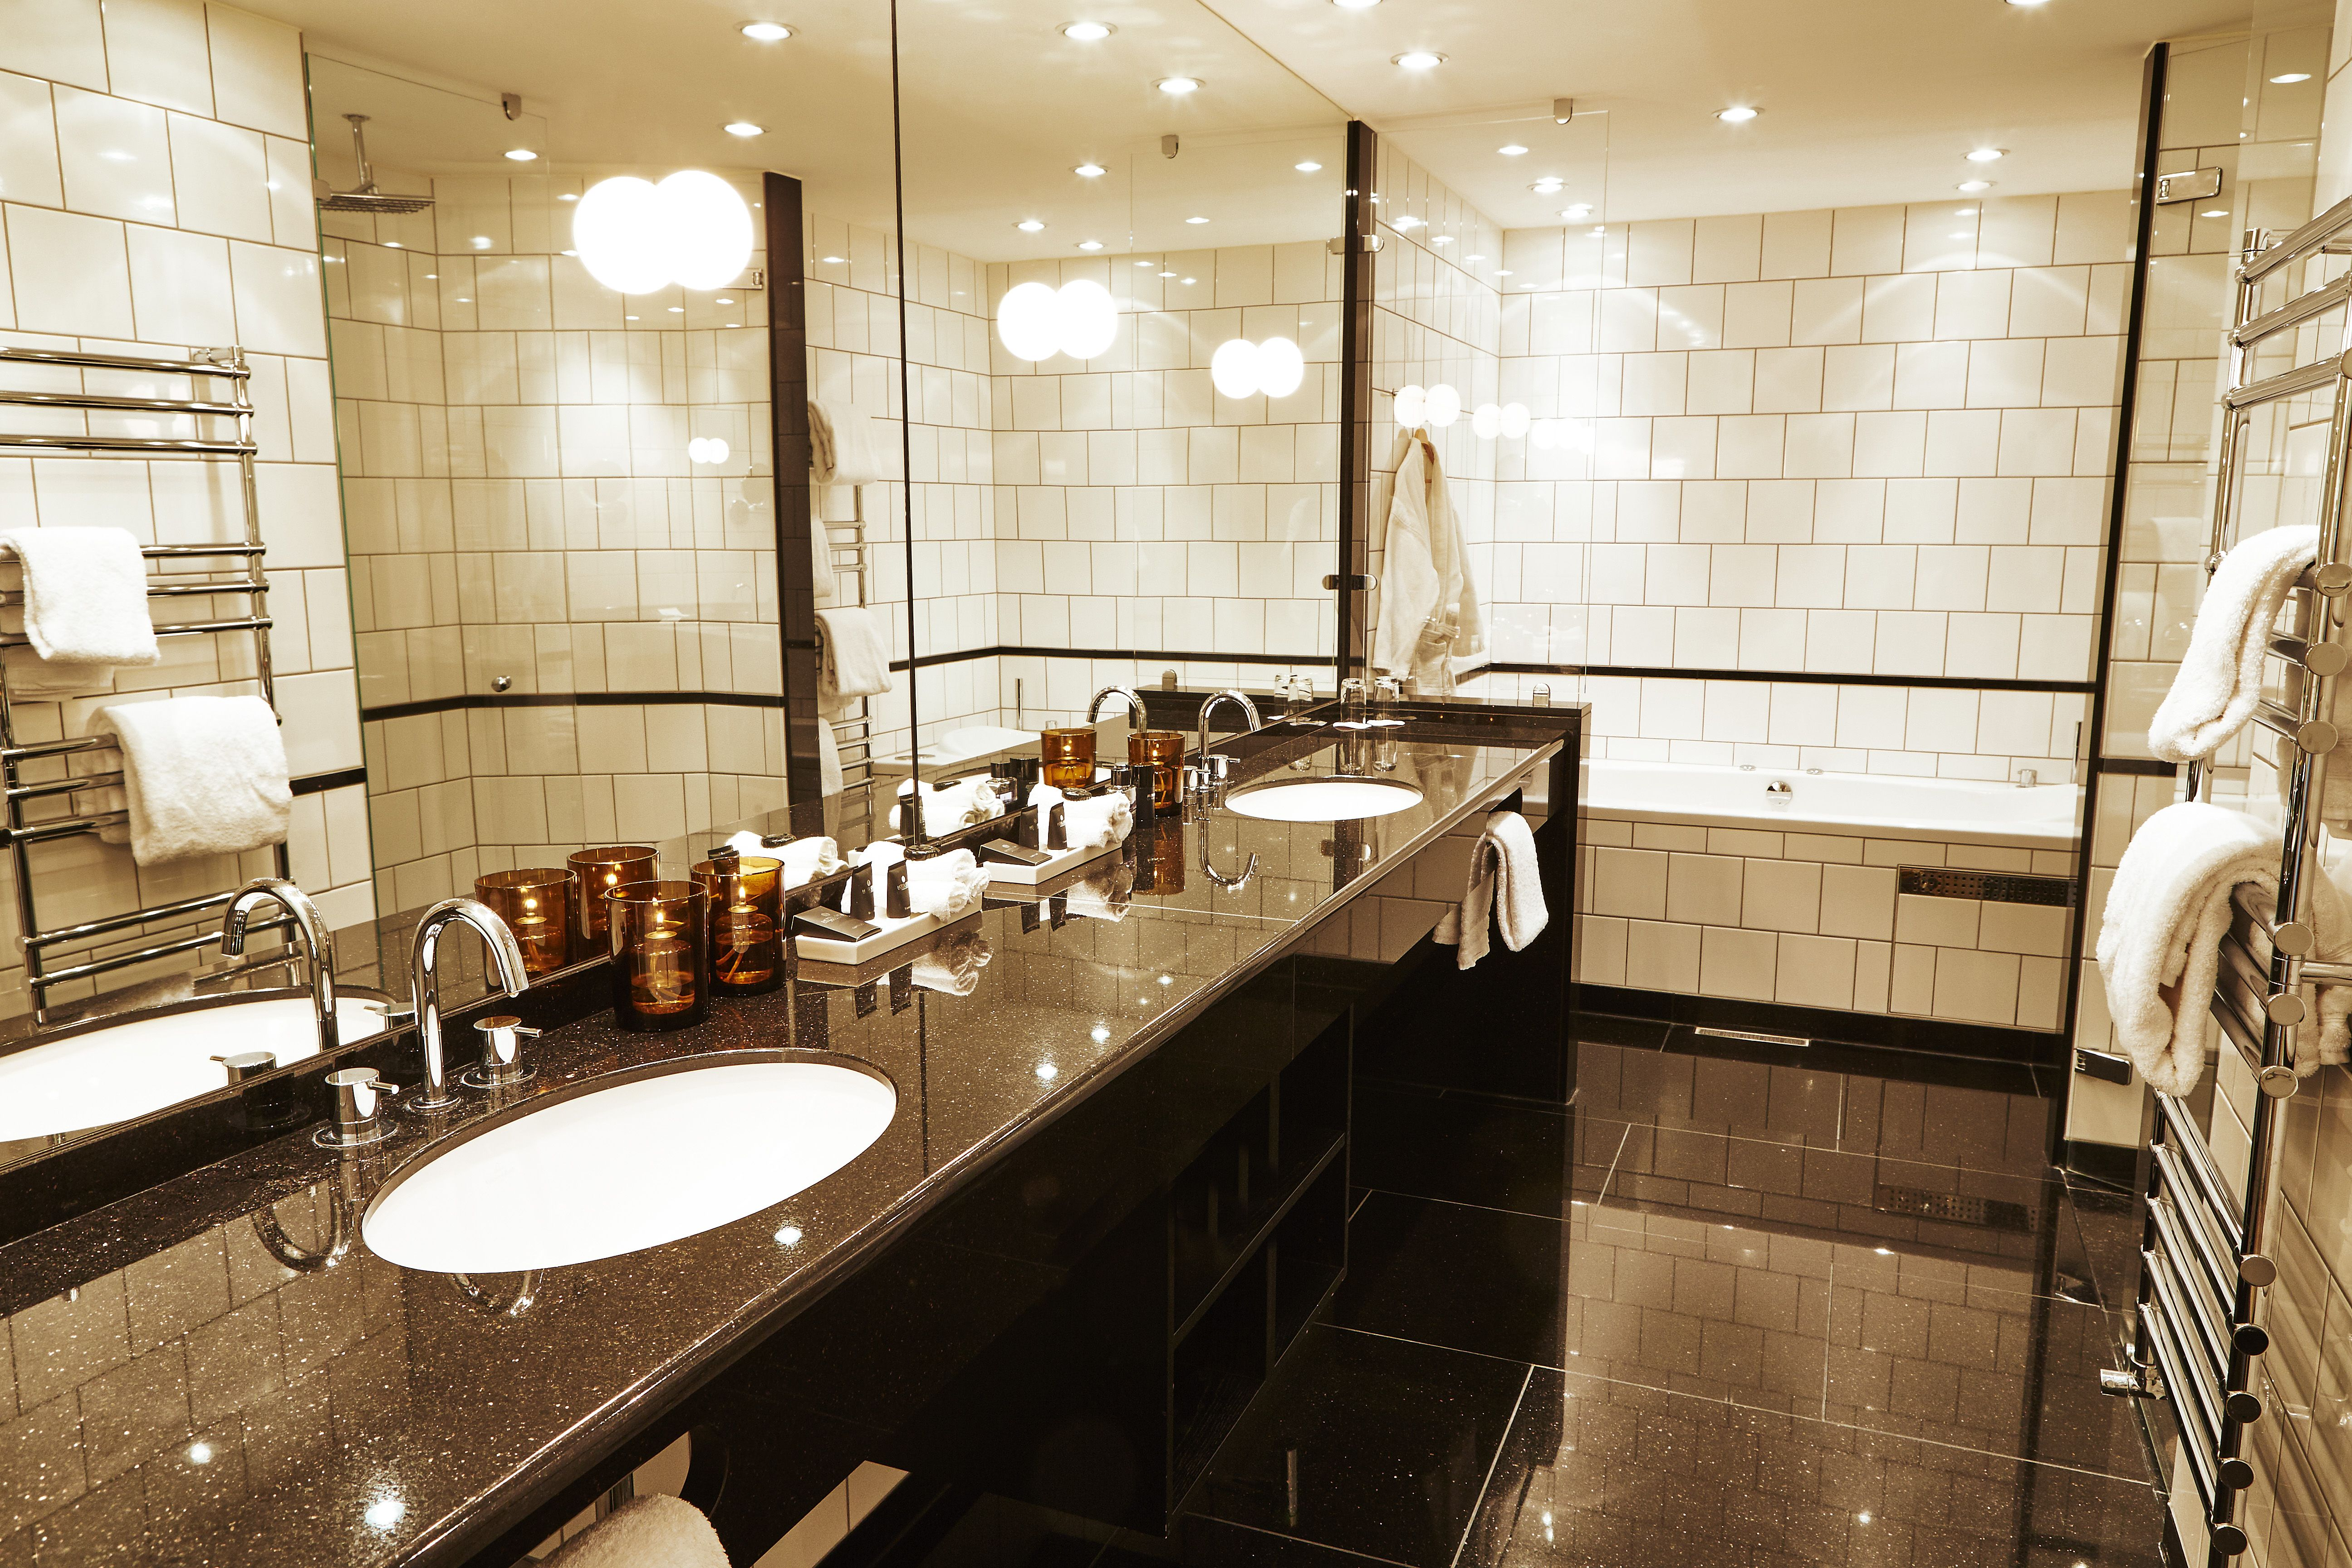 Juniorsuite badeværelse